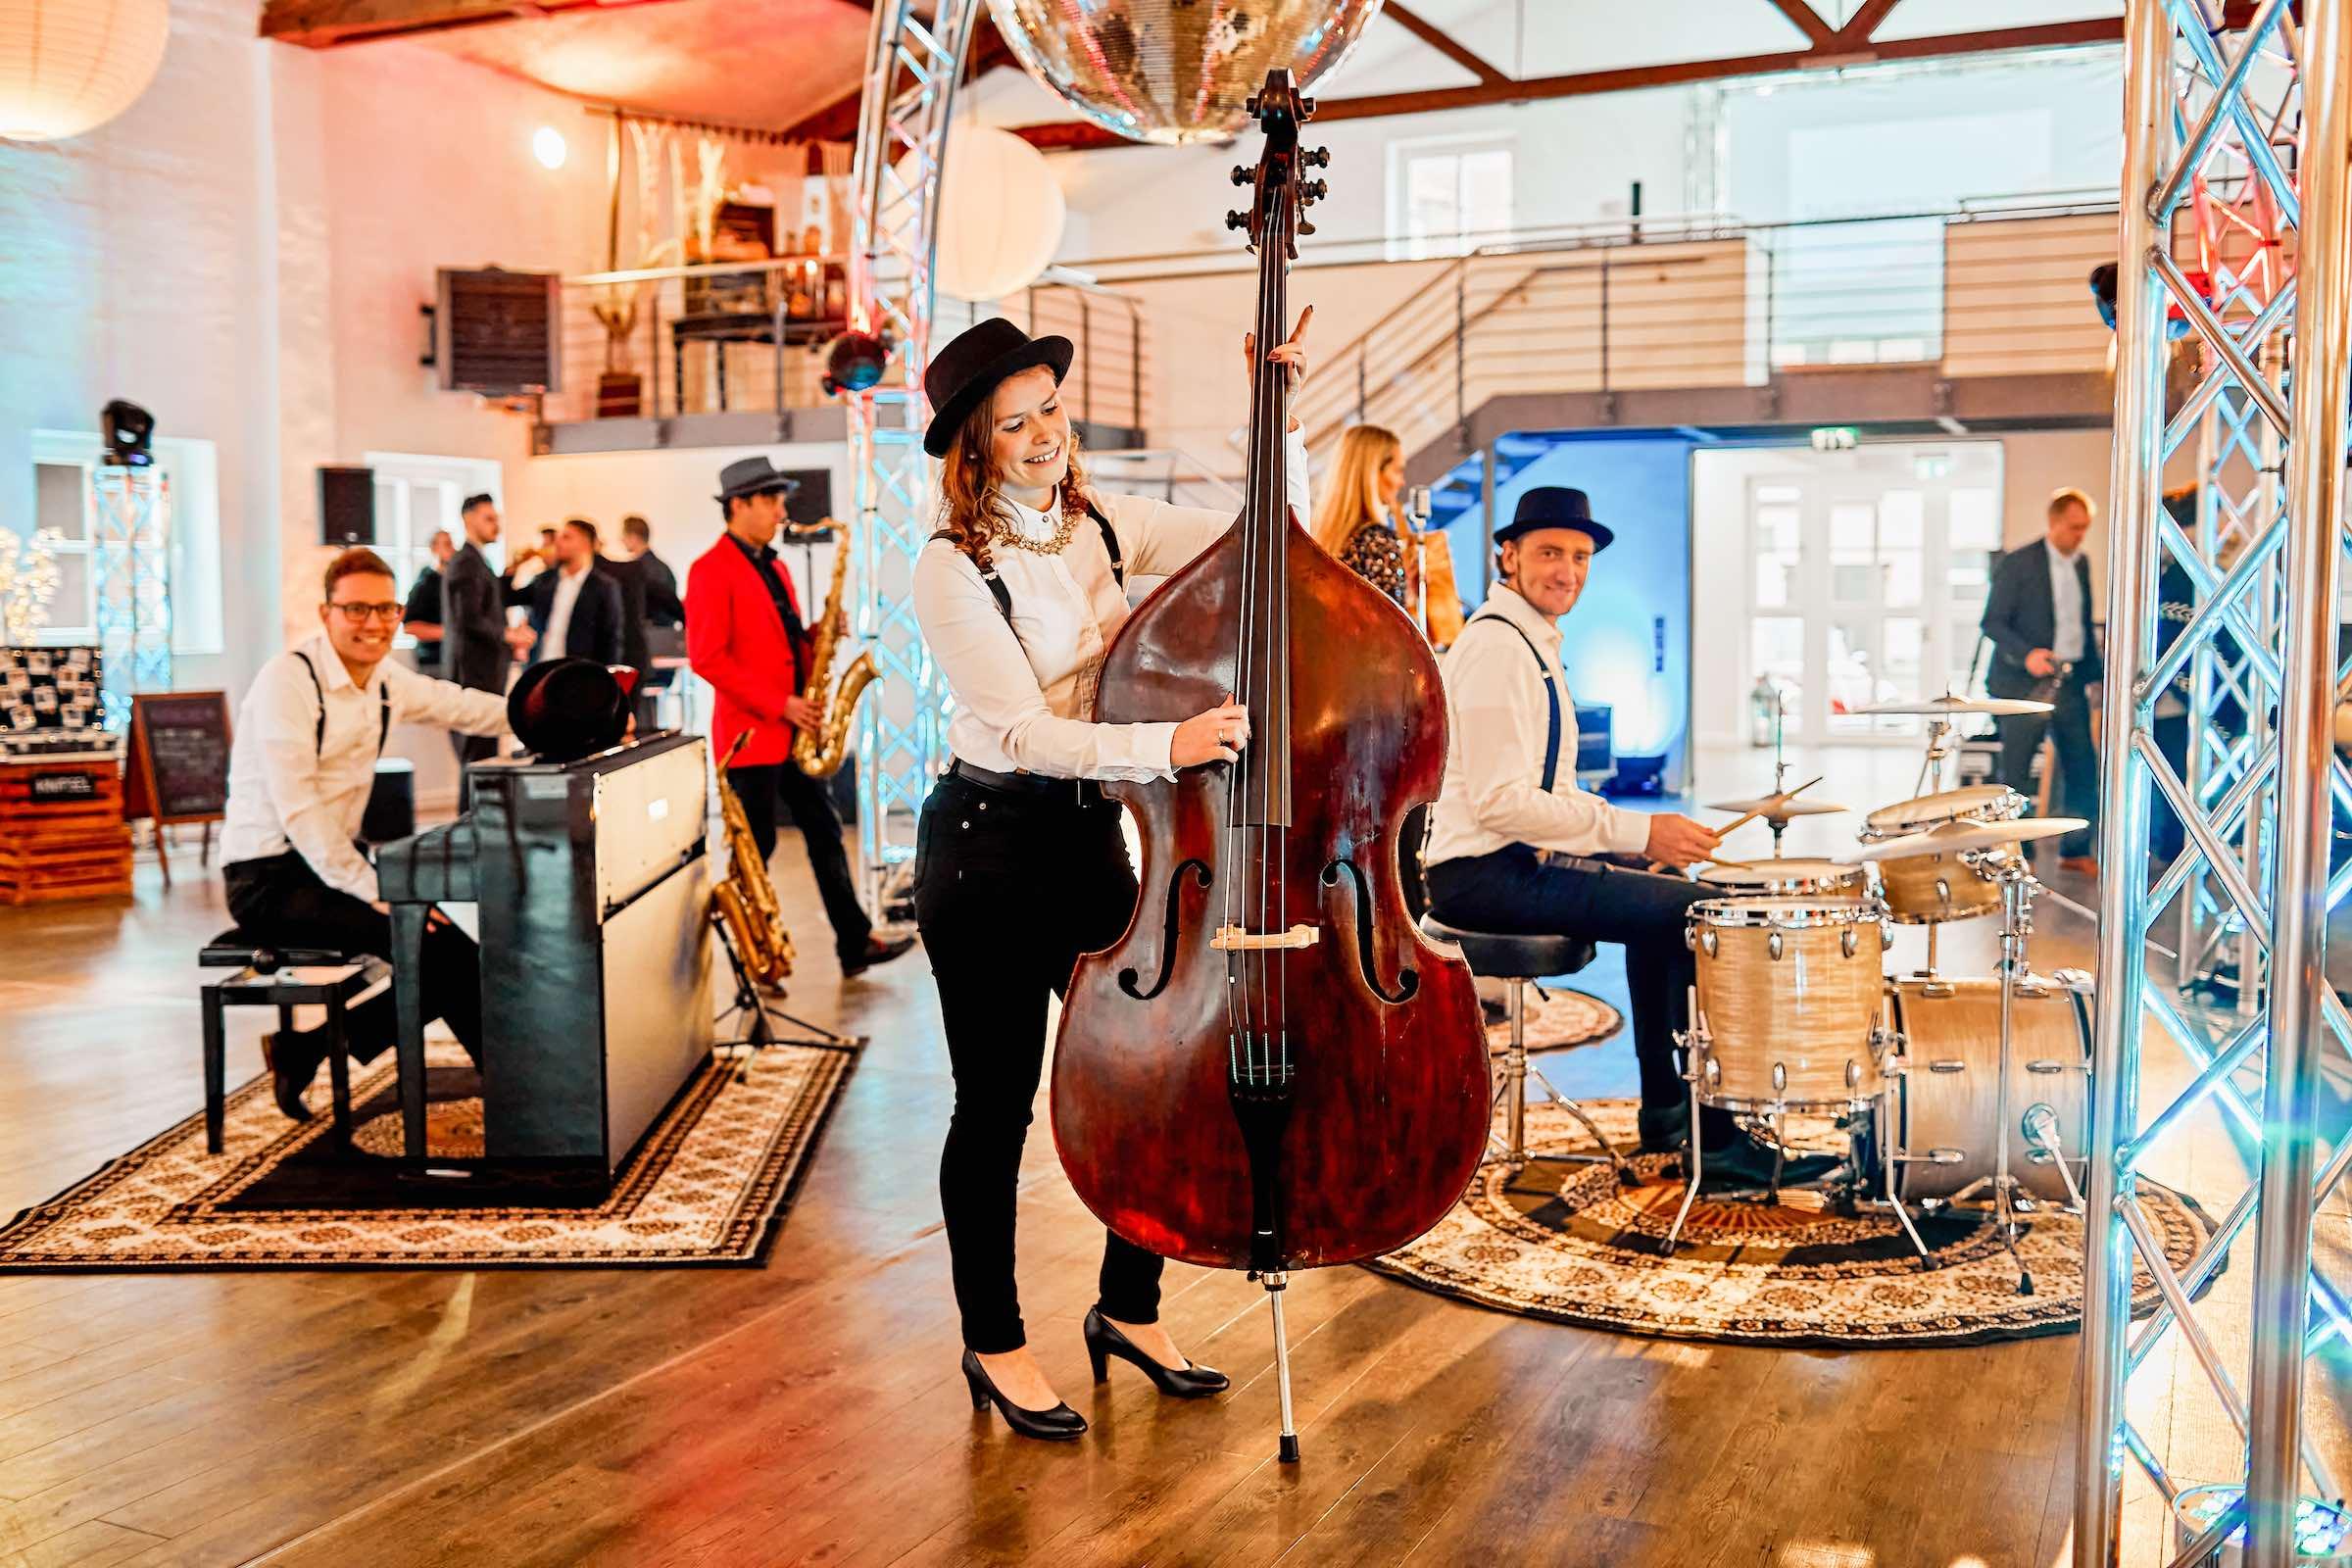 Band | Empfang | Sektempfang | Hochzeit | Hannover | Popband | Jazzband | Sektempfang | Kontrabass | Piano | Schlagzeug | Gesang | Party | Trauung | Dinner | Buchen | Mieten | Modern | Jukes